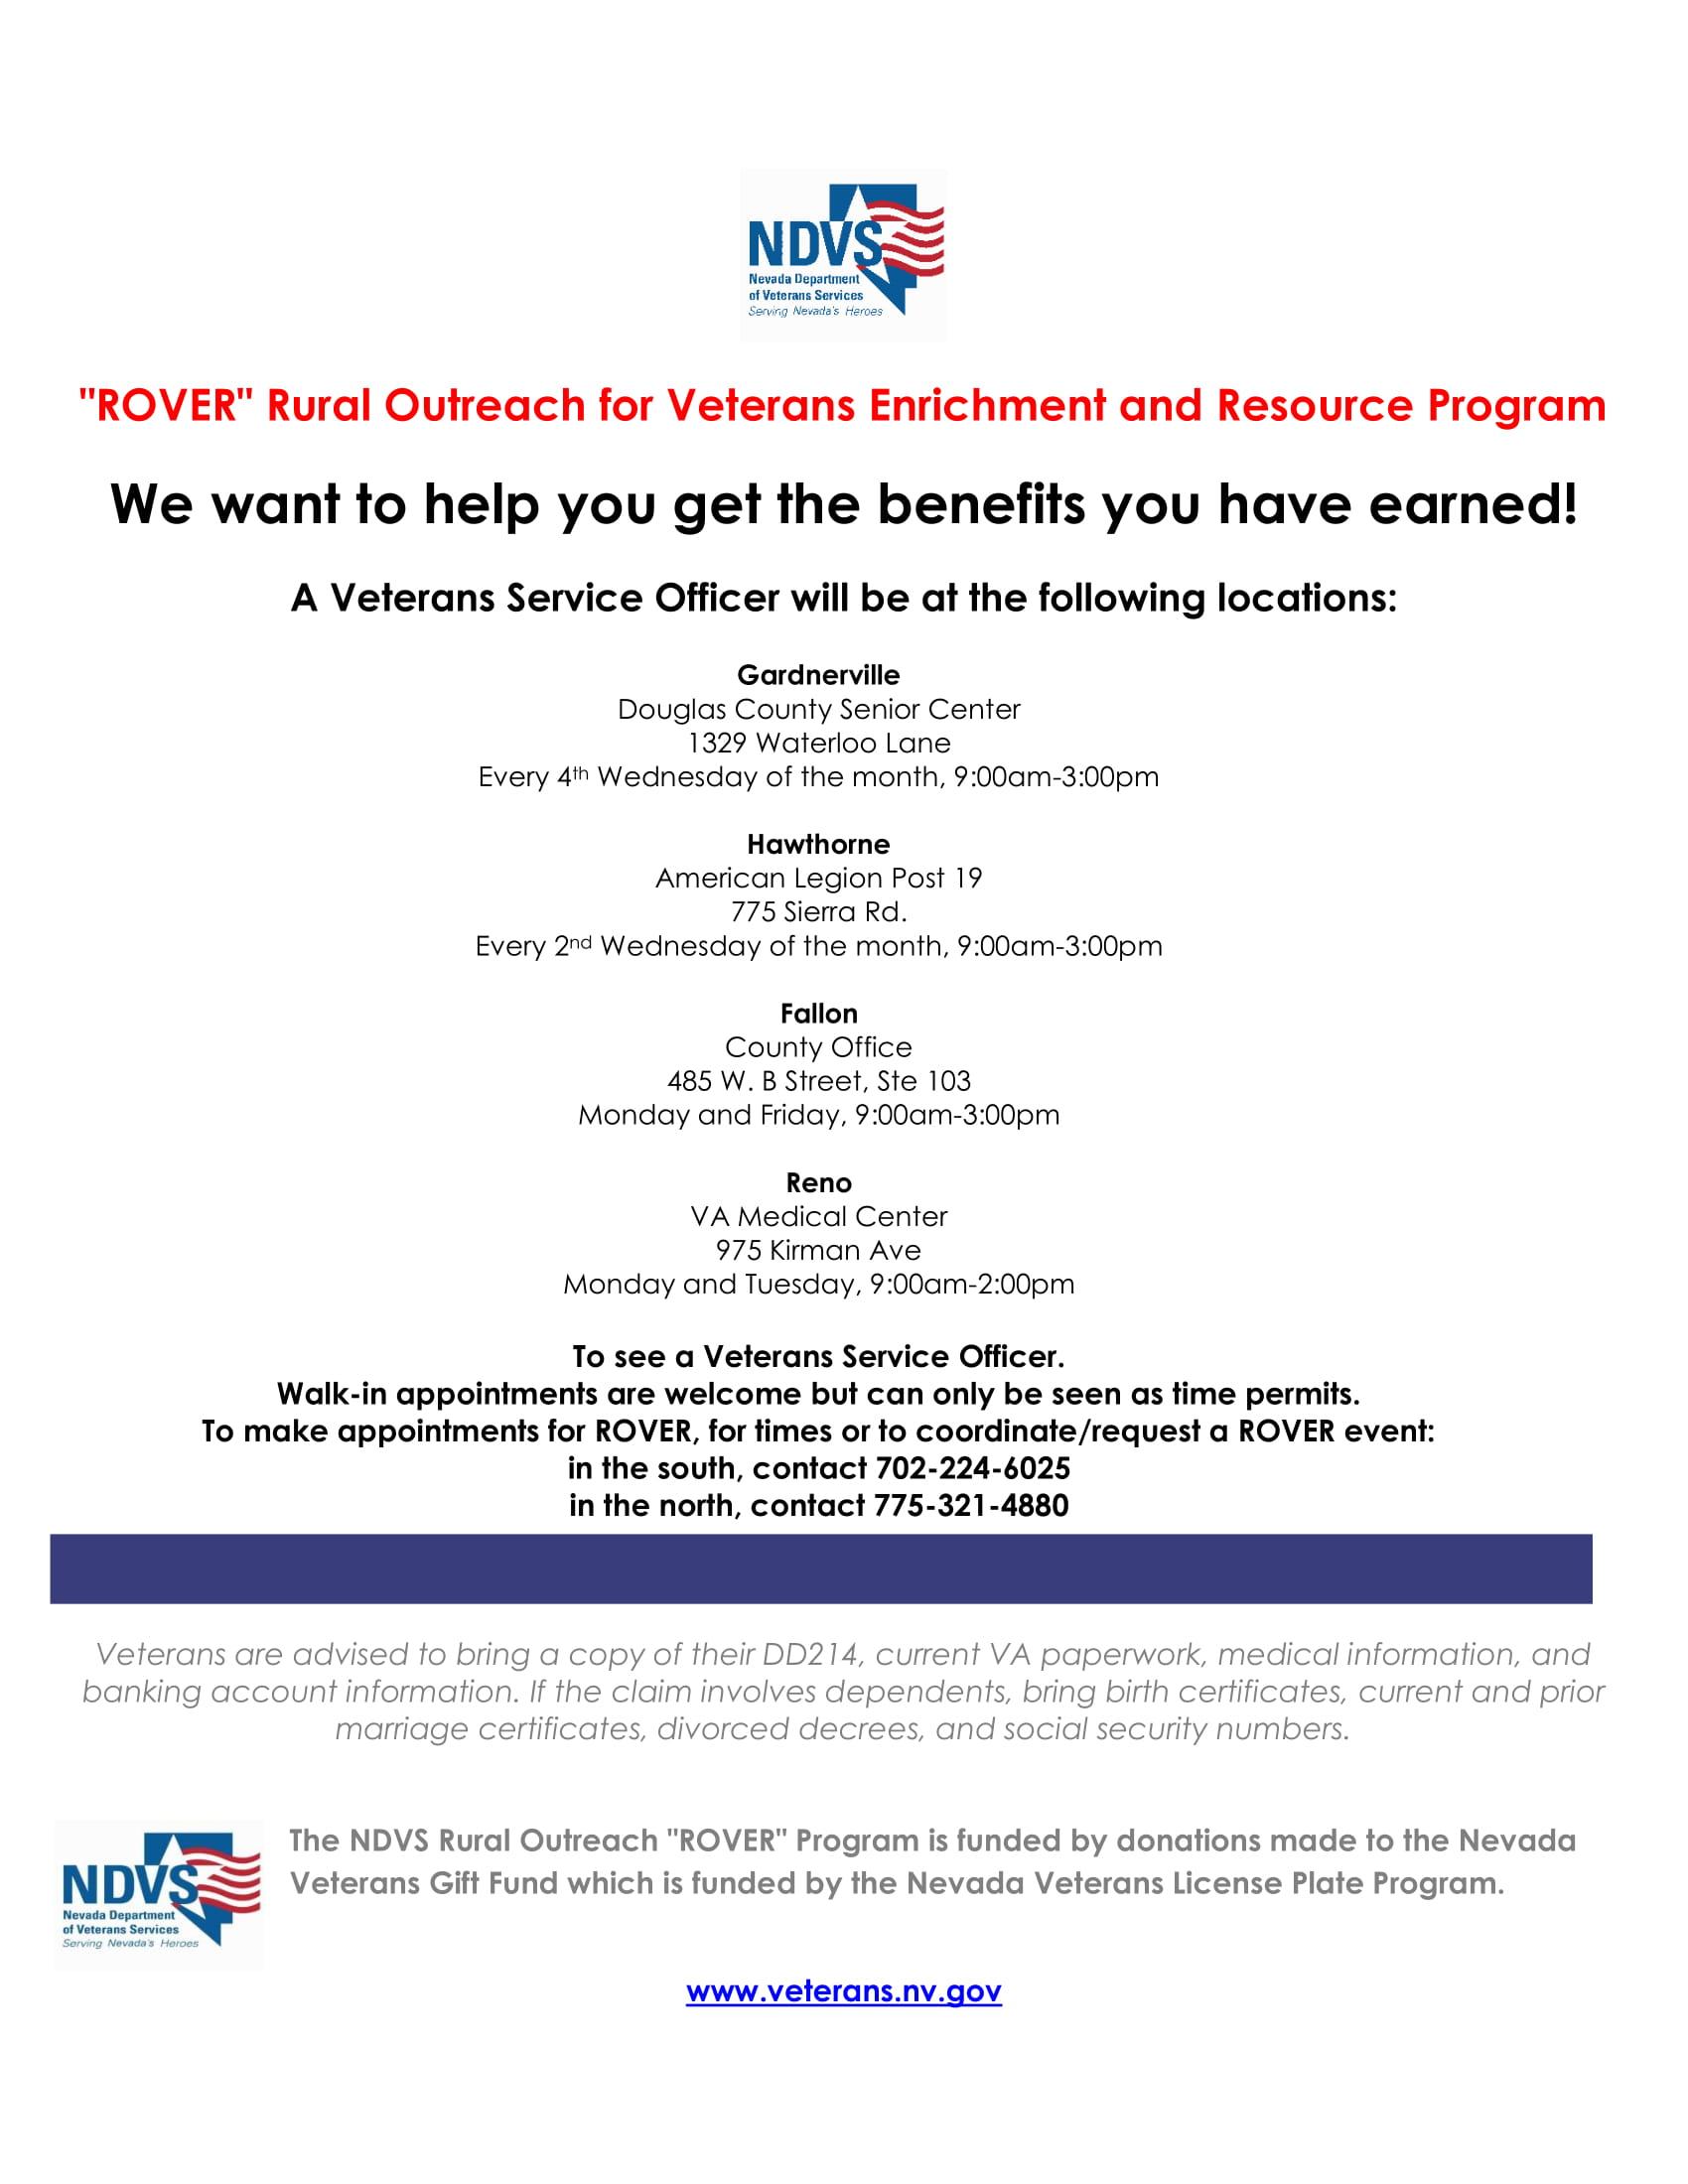 Reno Events Calendar February 2020 Reno VA ROVER (North)   Nevada Department of Veterans Services